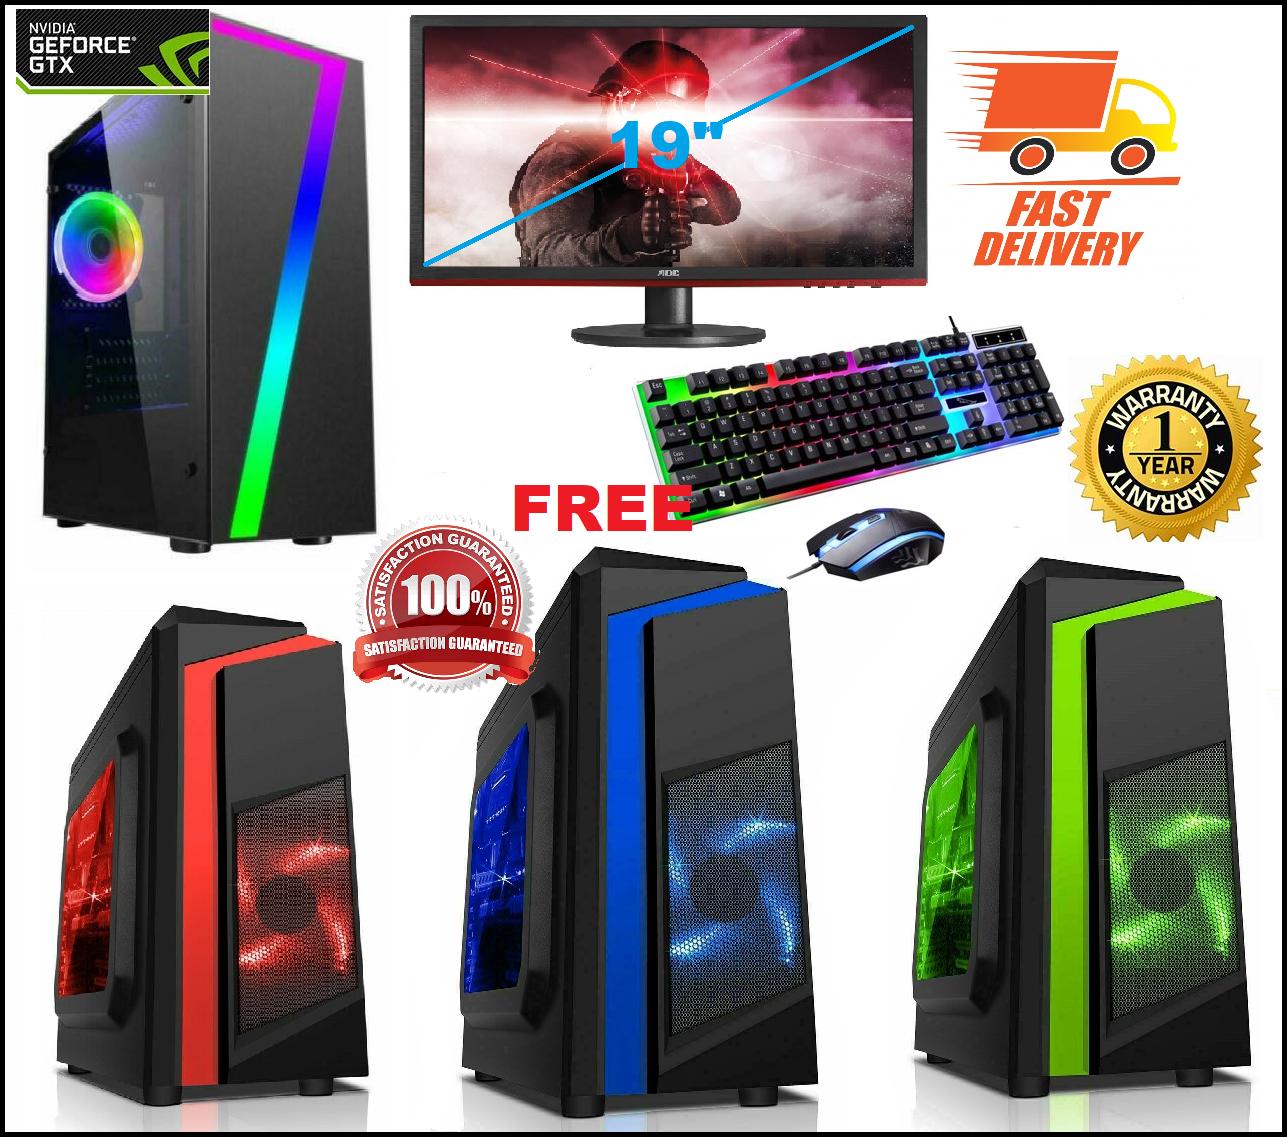 Computer Games - FAST Intel Core i5 Gaming PC Computer 8GB RAM 1TB HDD Windows 10 GT 710 2GB WiFi